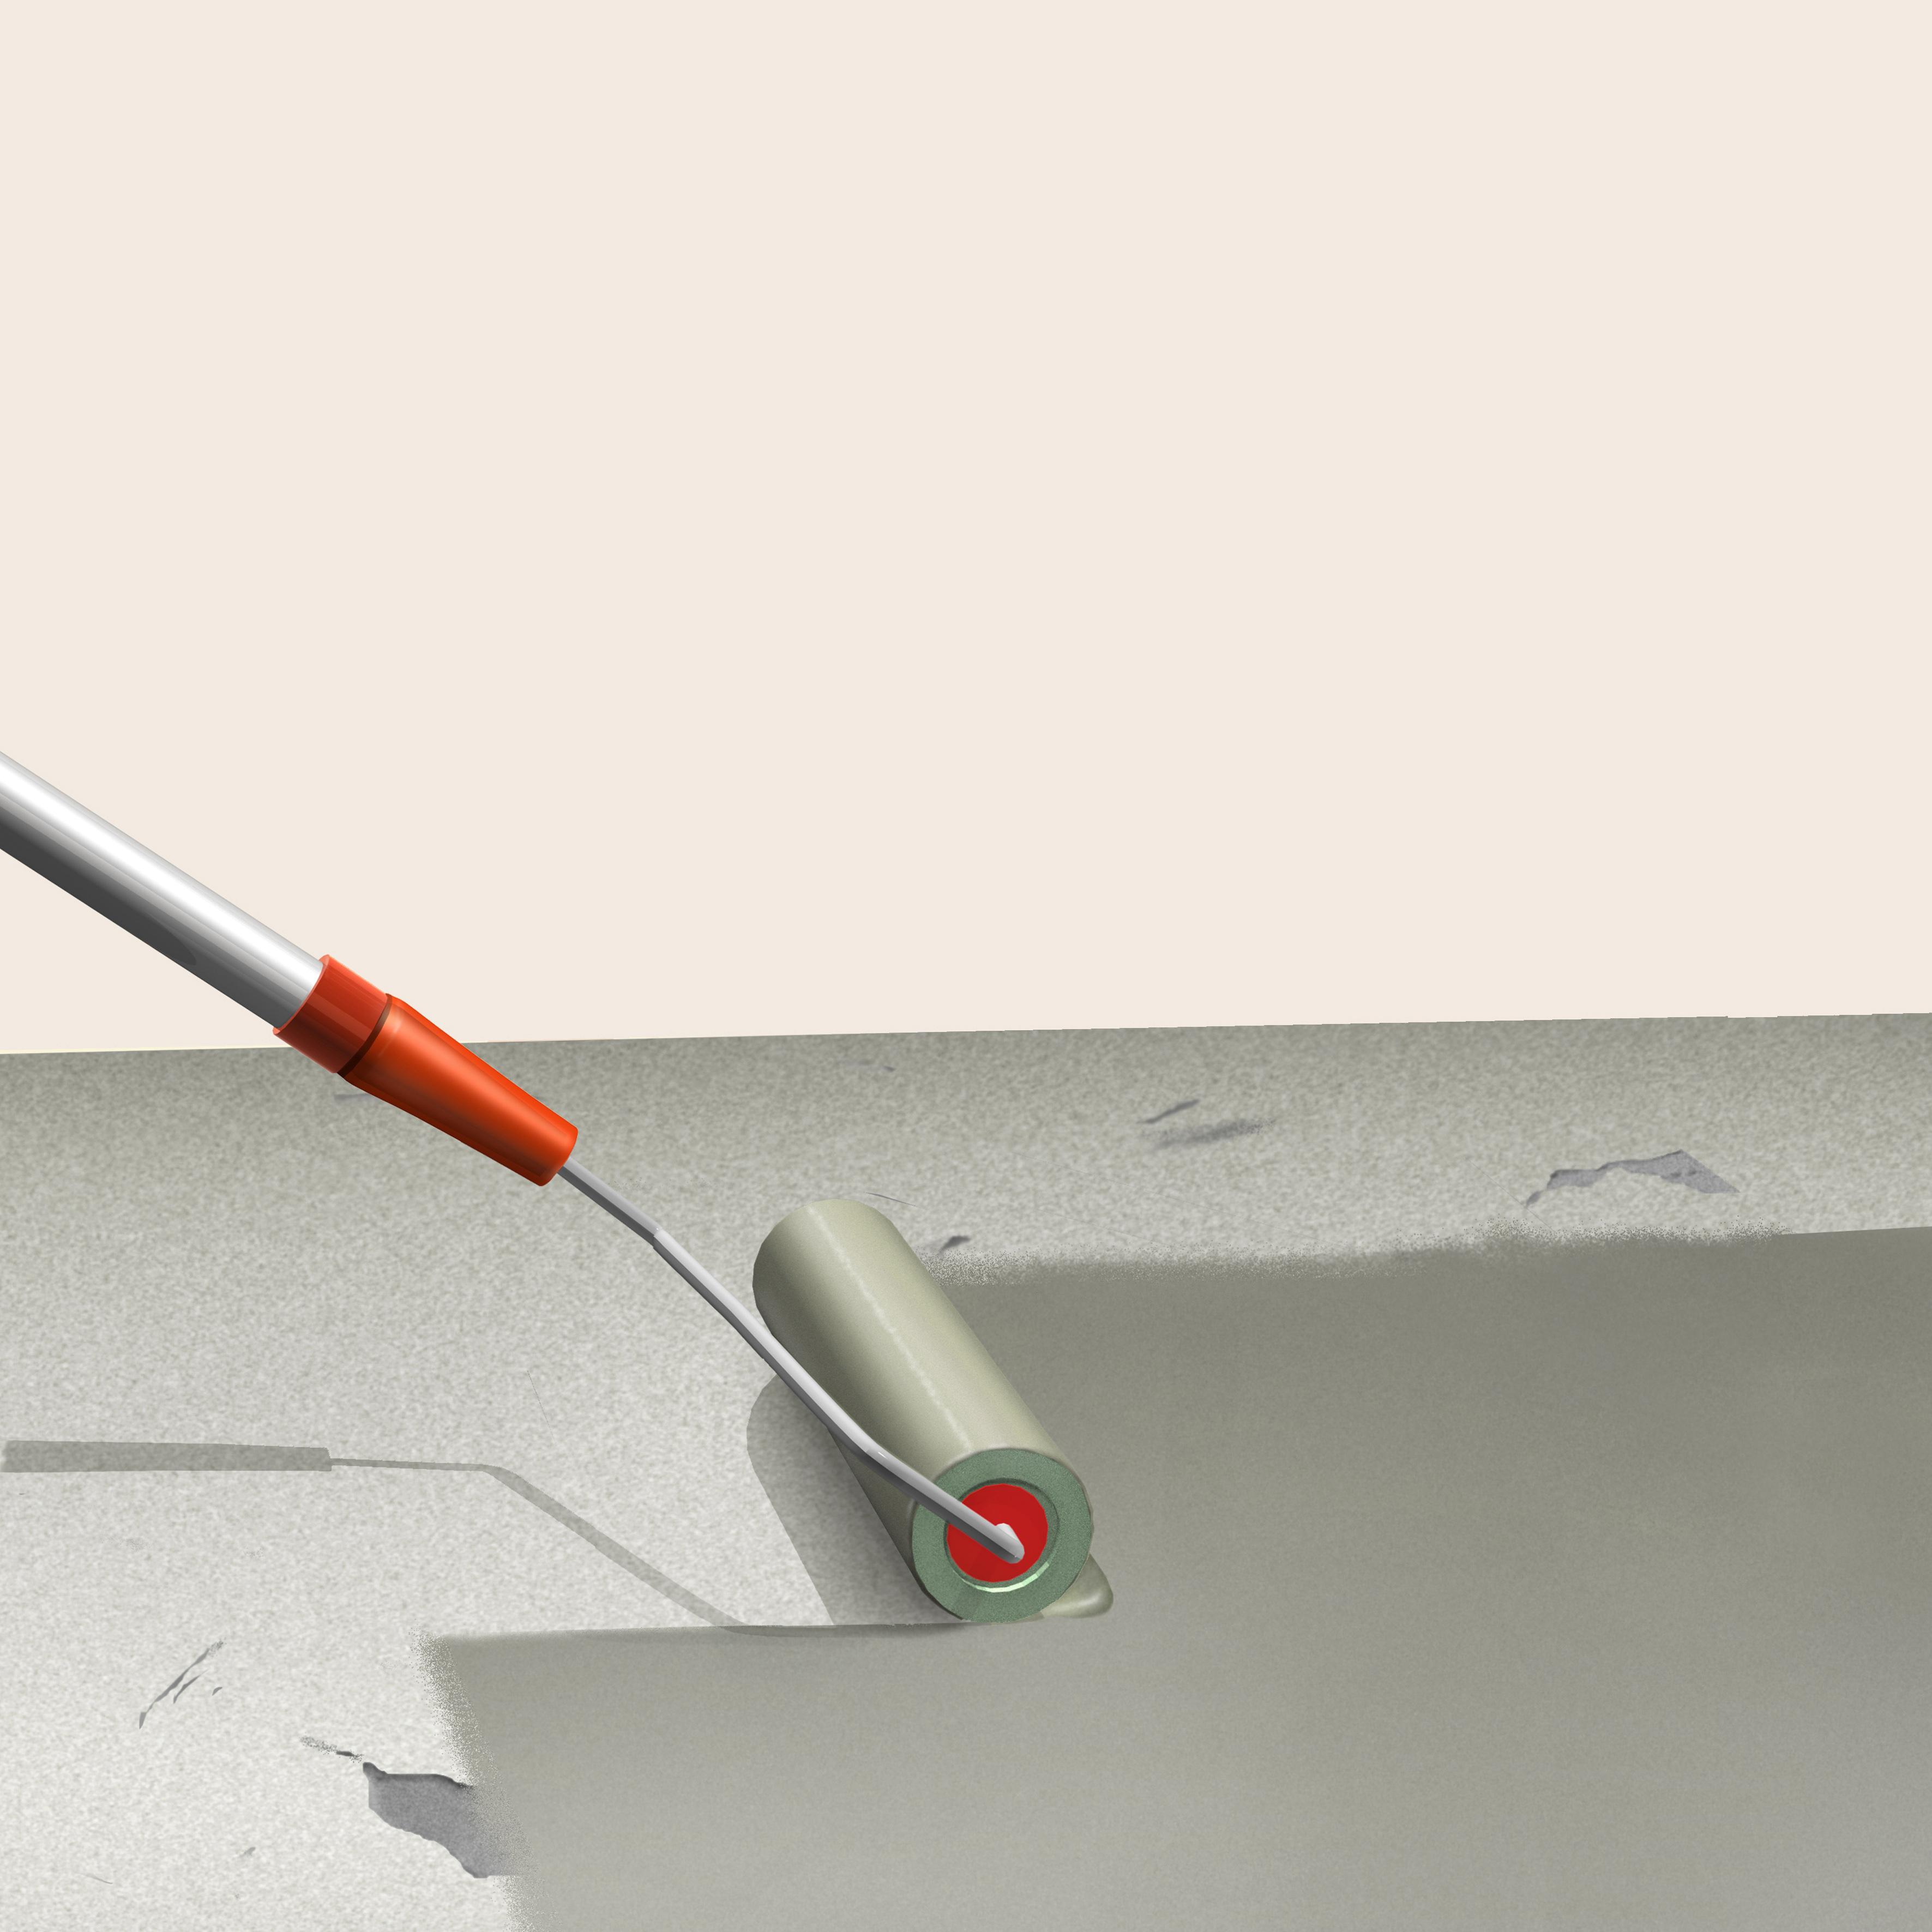 Sapa autonivelanta pe baza de ciment - Produs si aplicare SIKA - Poza 4